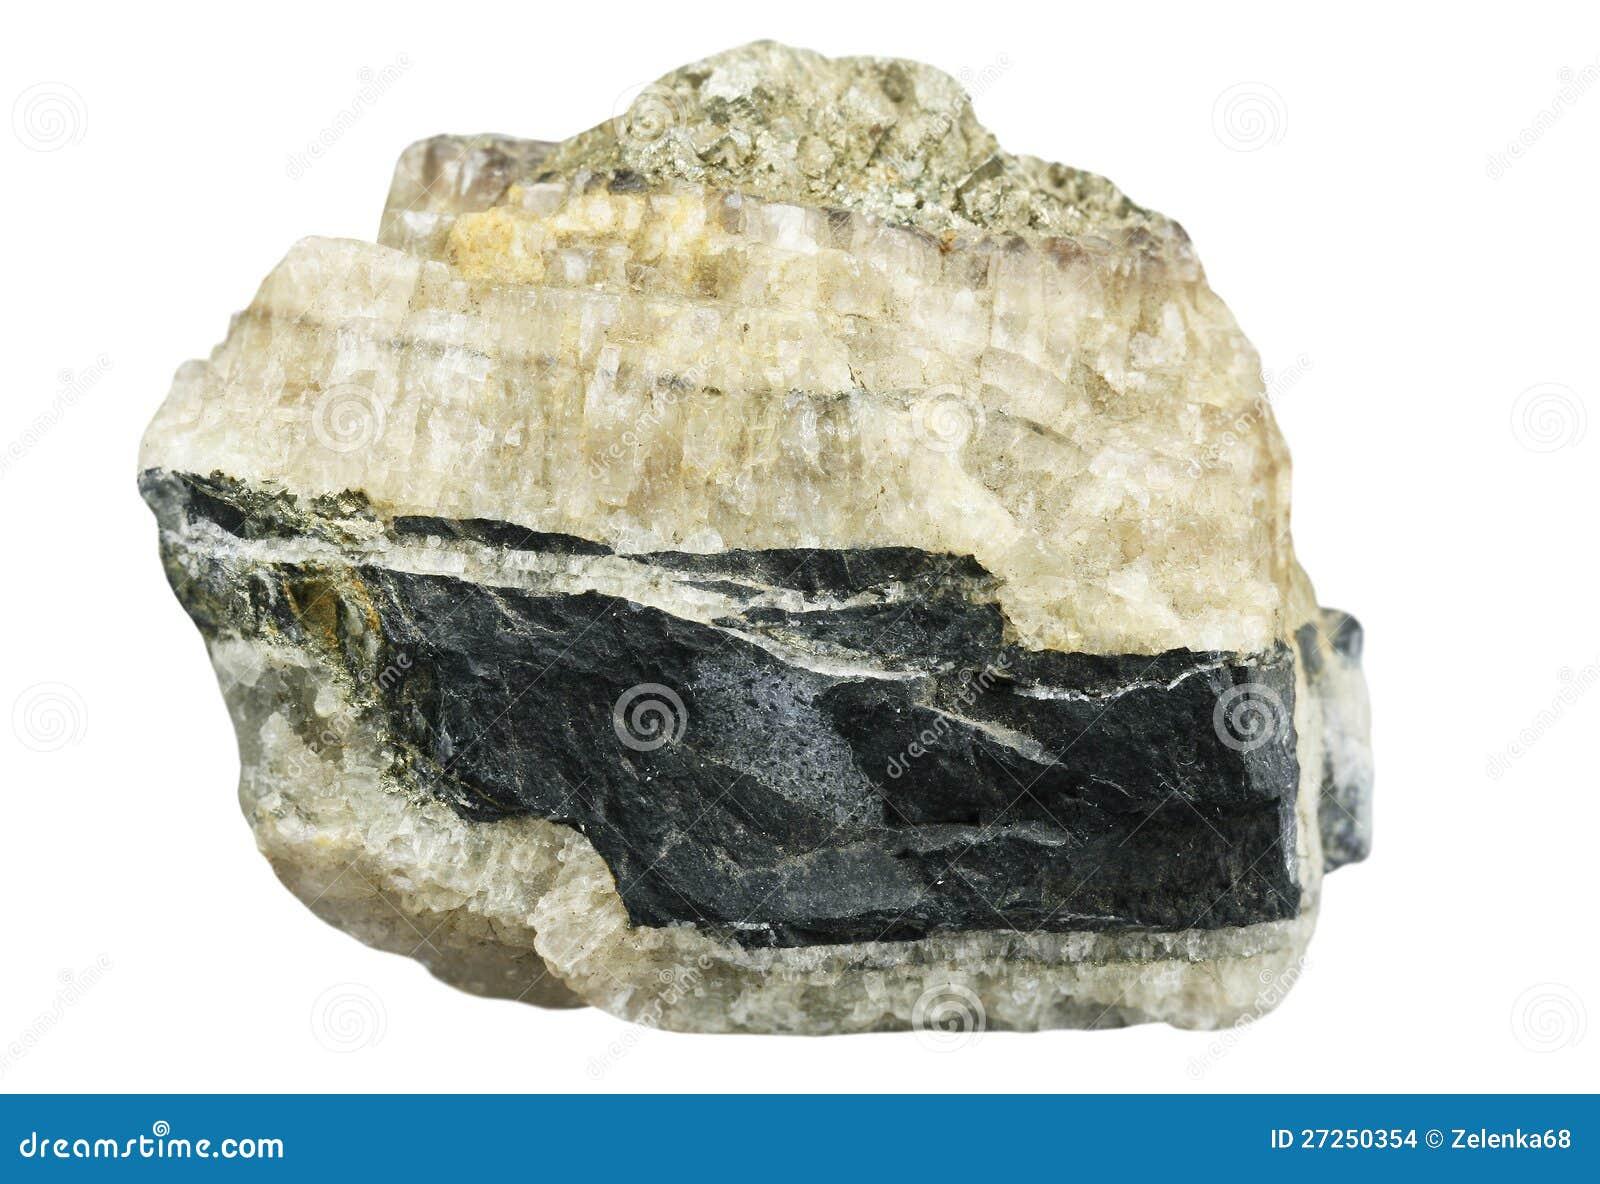 Lump of rock